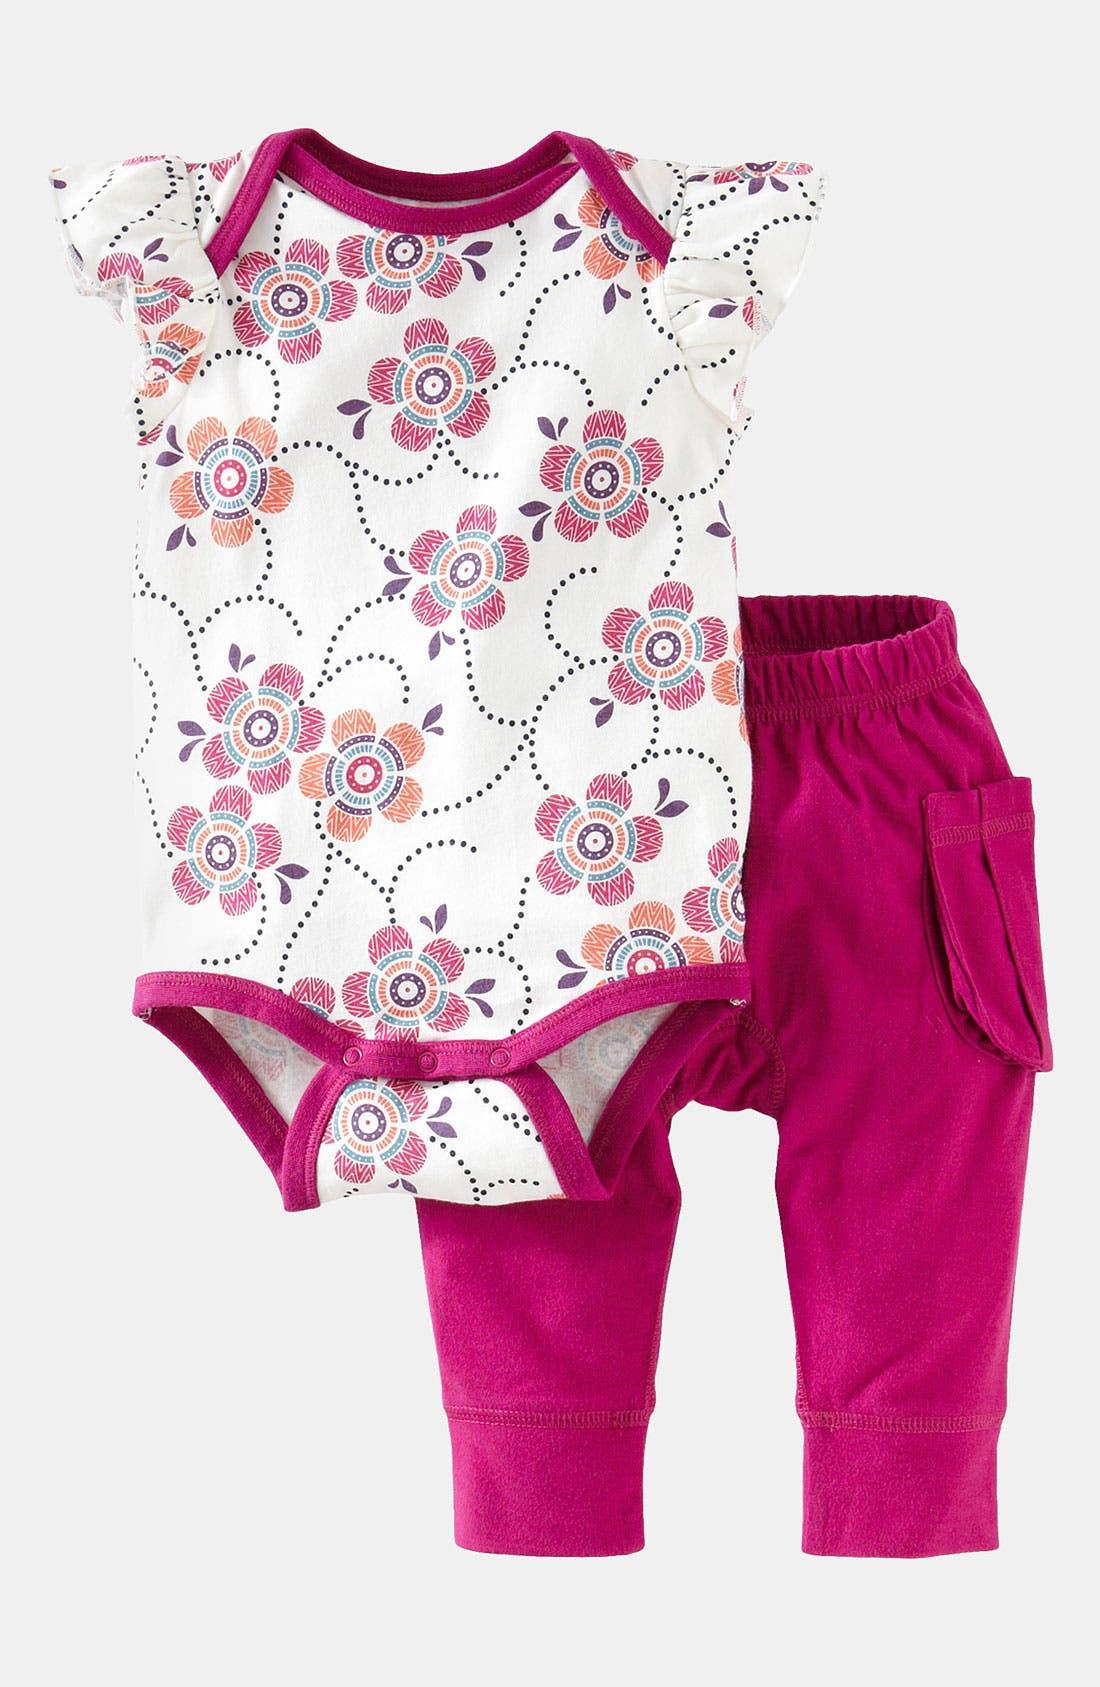 Alternate Image 1 Selected - Tea Collection 'Flutter' Bodysuit & Leggings (Infant)